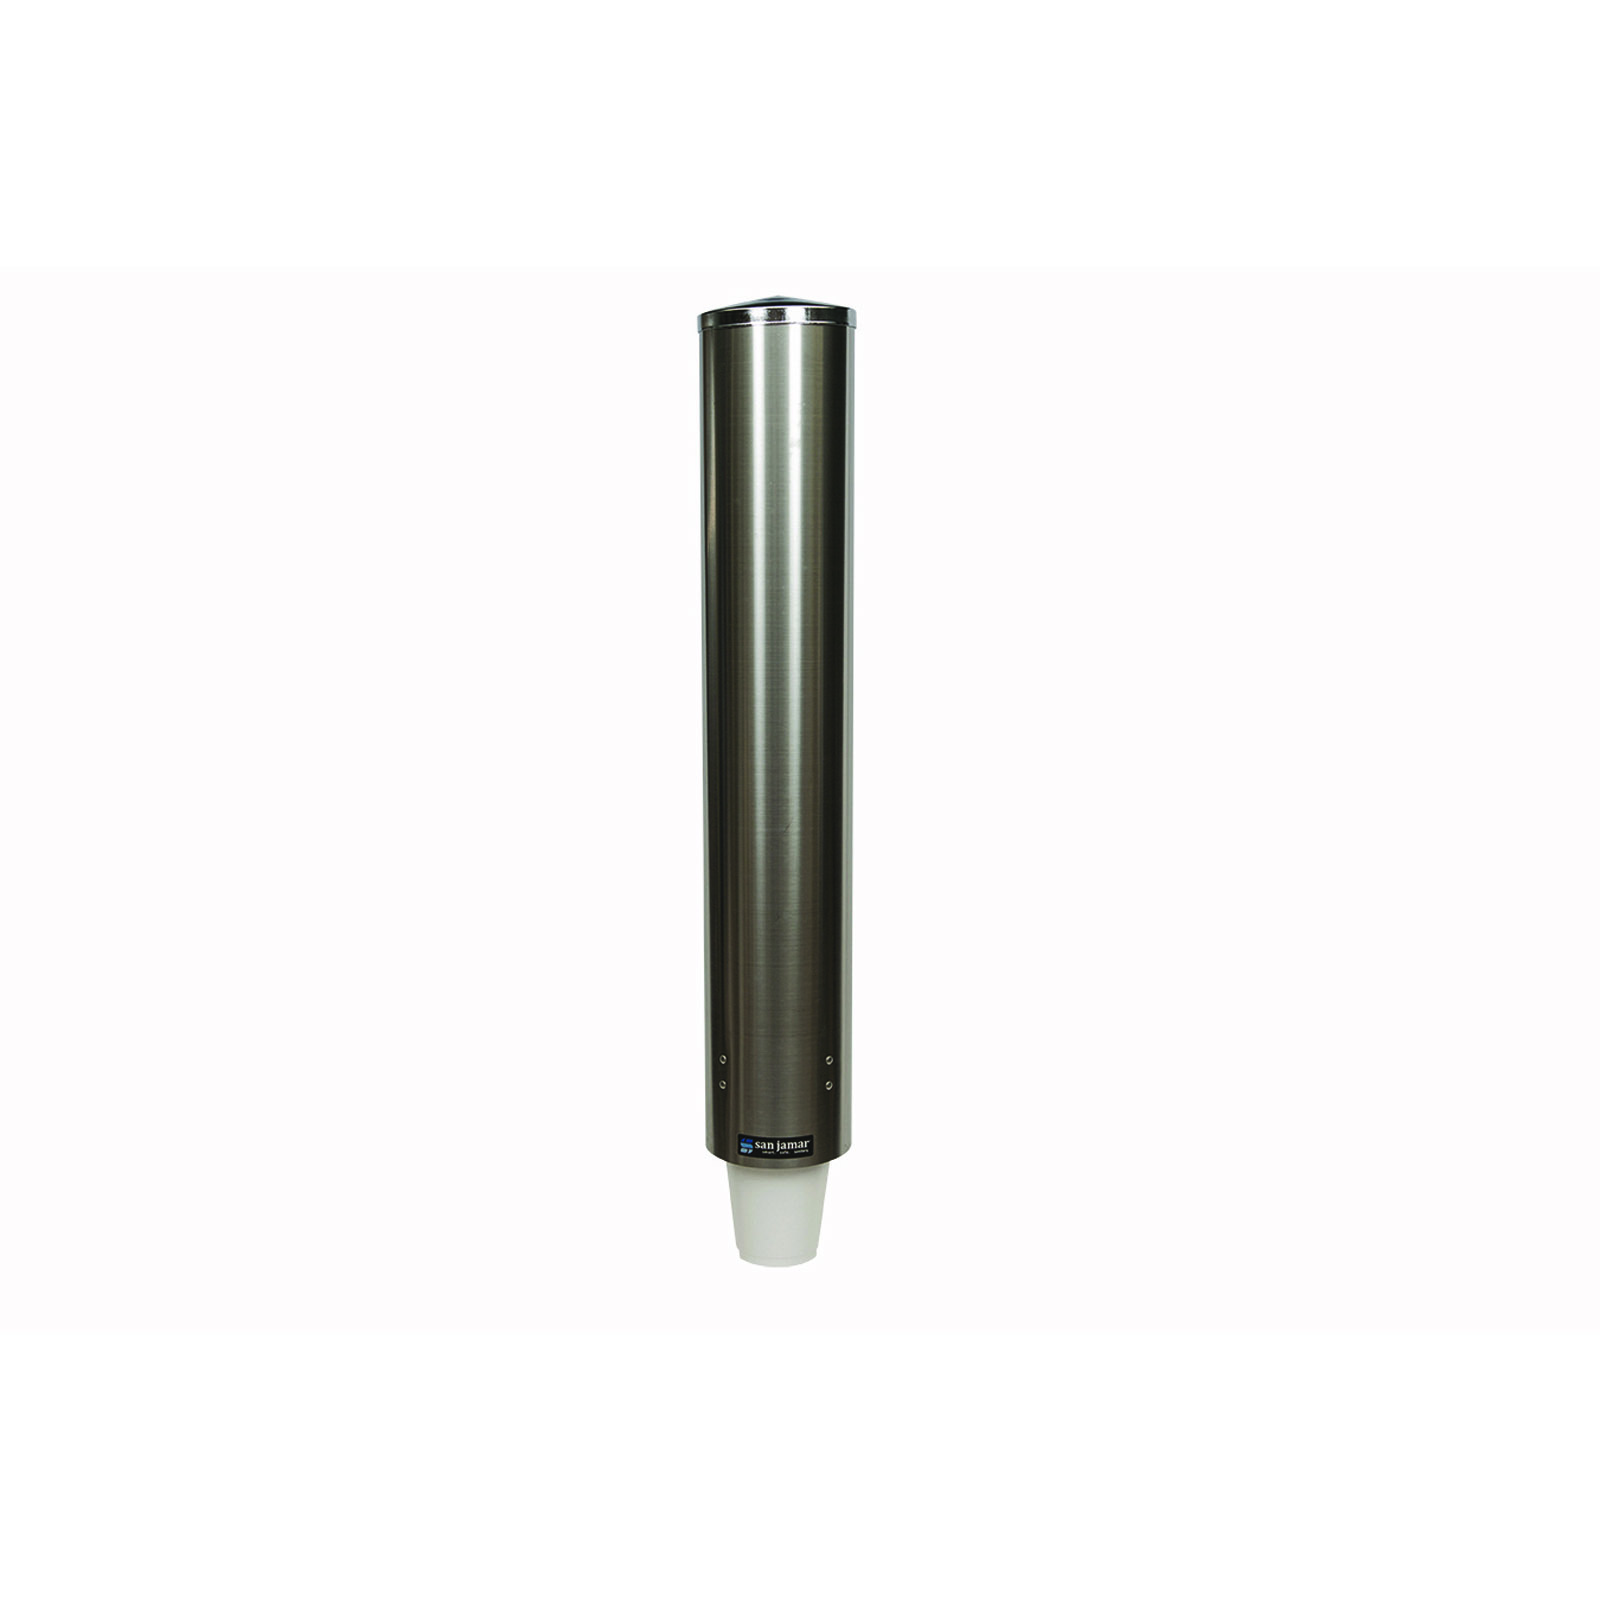 San Jamar C4500PF cup dispensers, wall mount